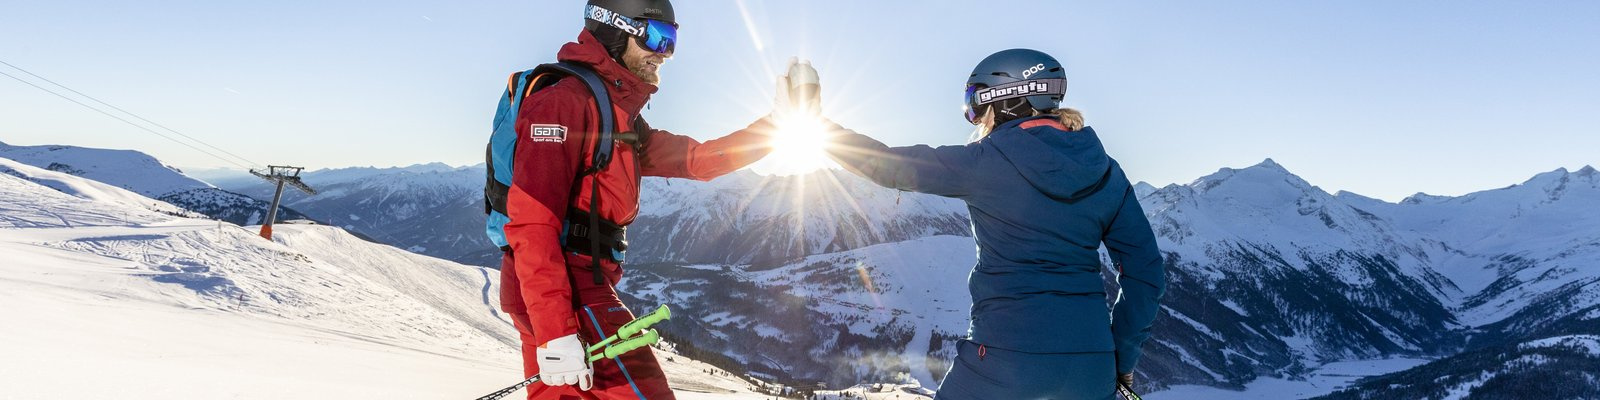 Sunrise skiing ©Johannes Sautner (Zillertal Arena)